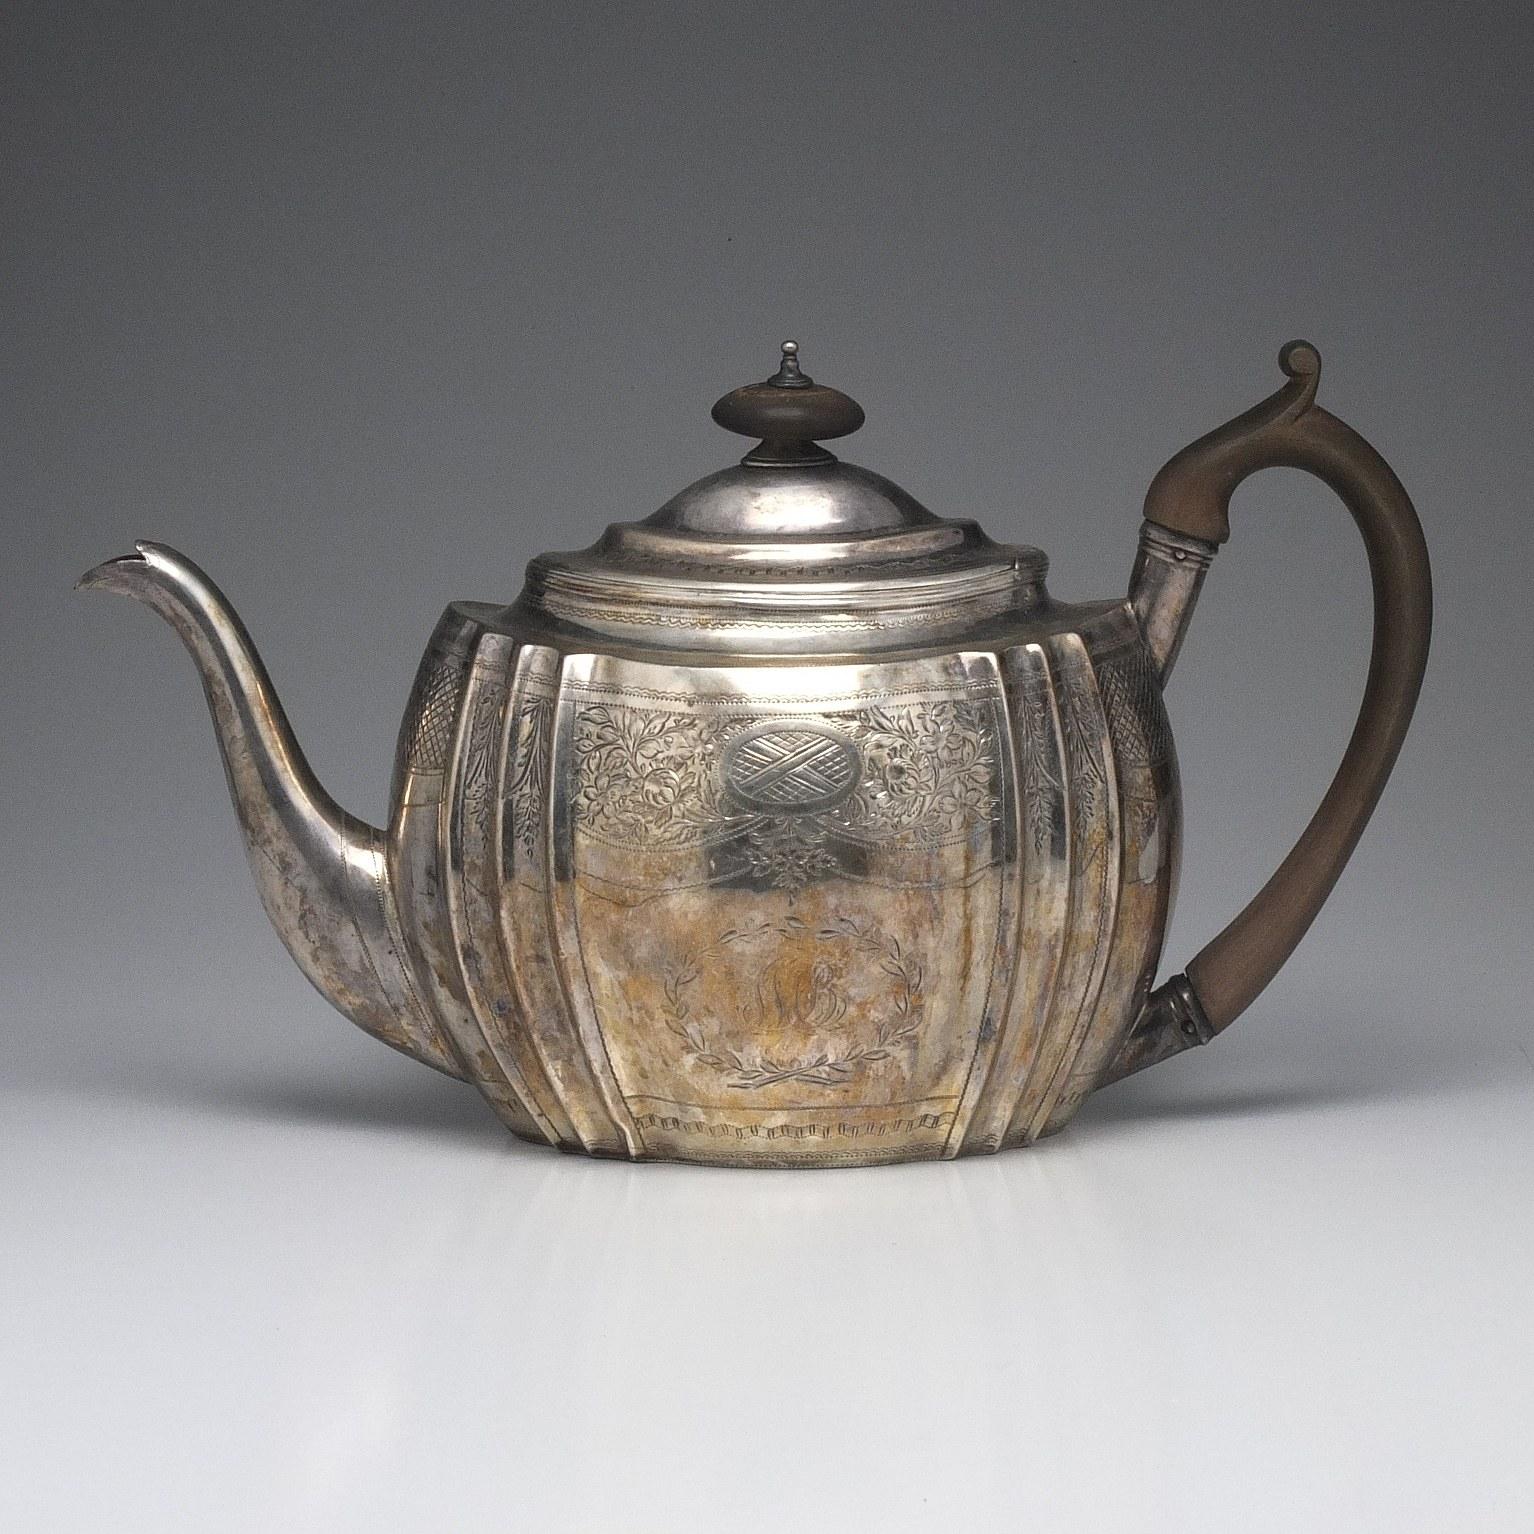 'George III Monogrammed Sterling Silver Teapot Samuel Godbehere, Edward Wigan & James Boult London 1802'